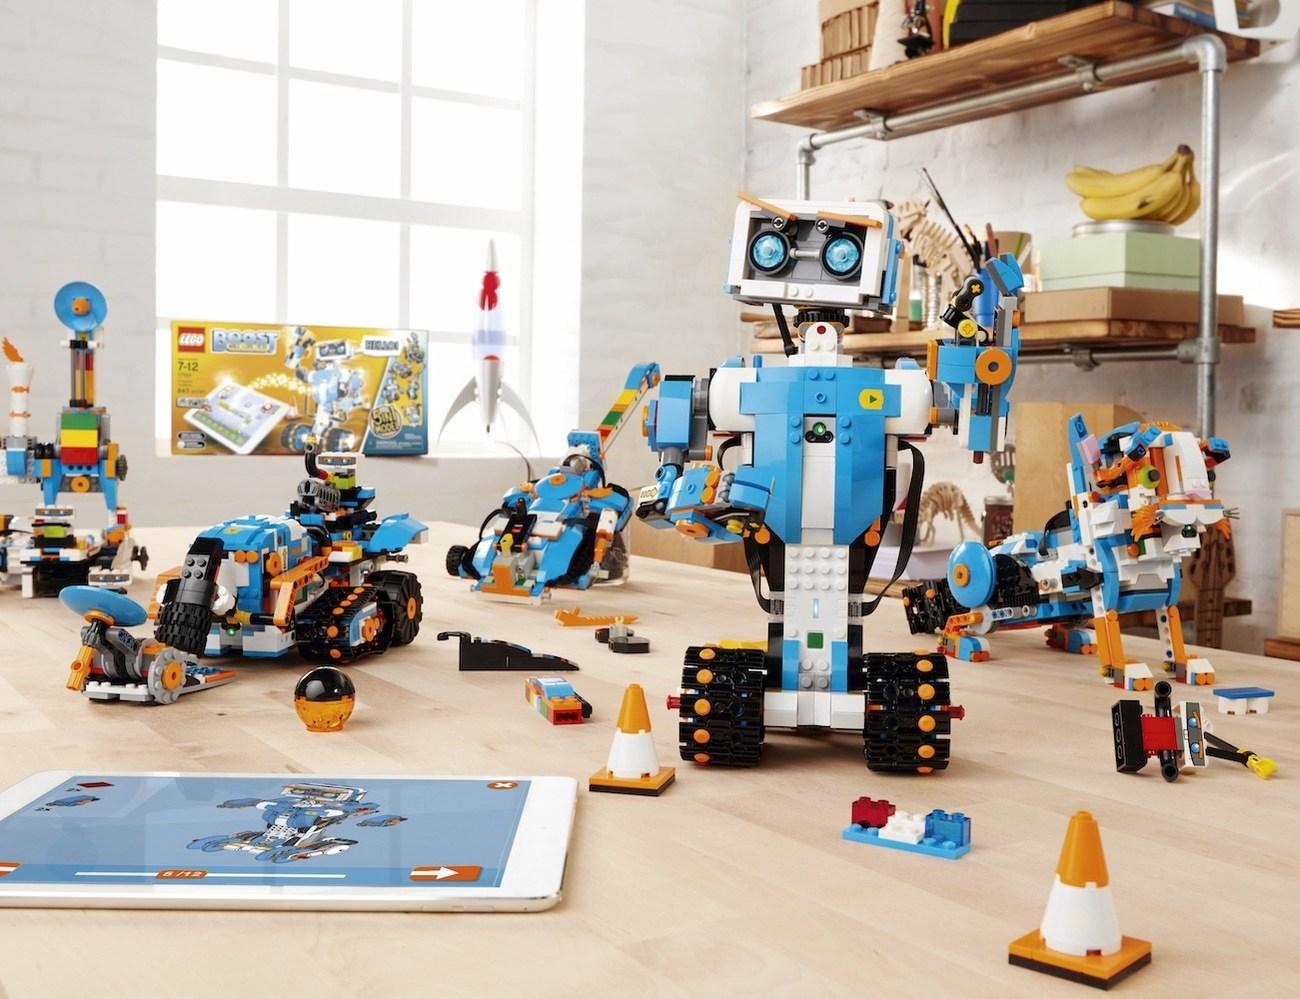 Robot+Building+Kit